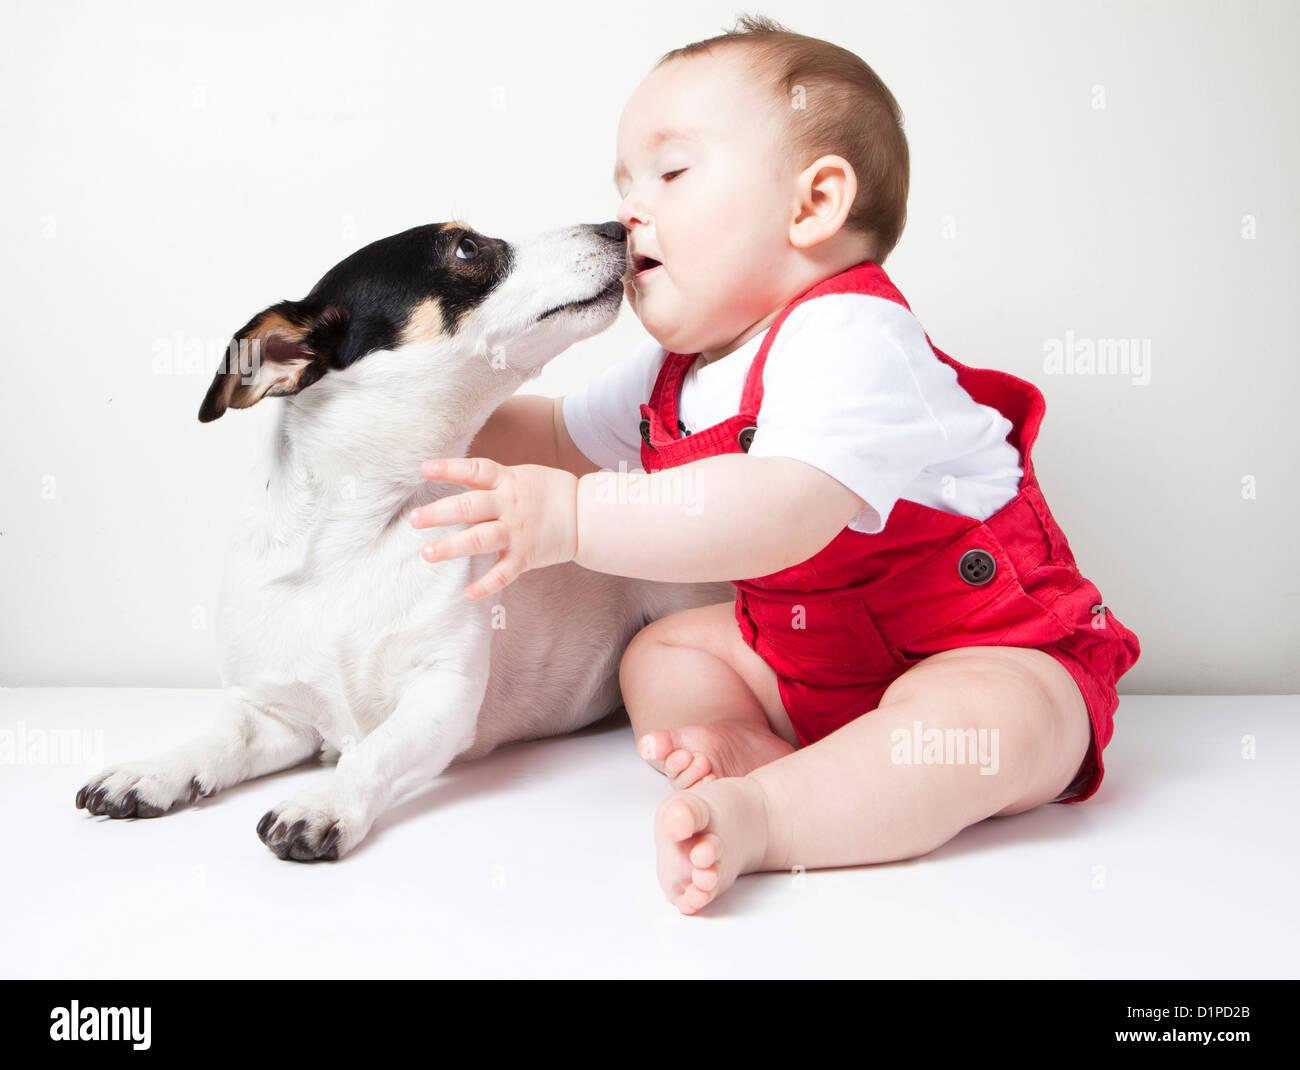 baby girl with dog - Stock Image